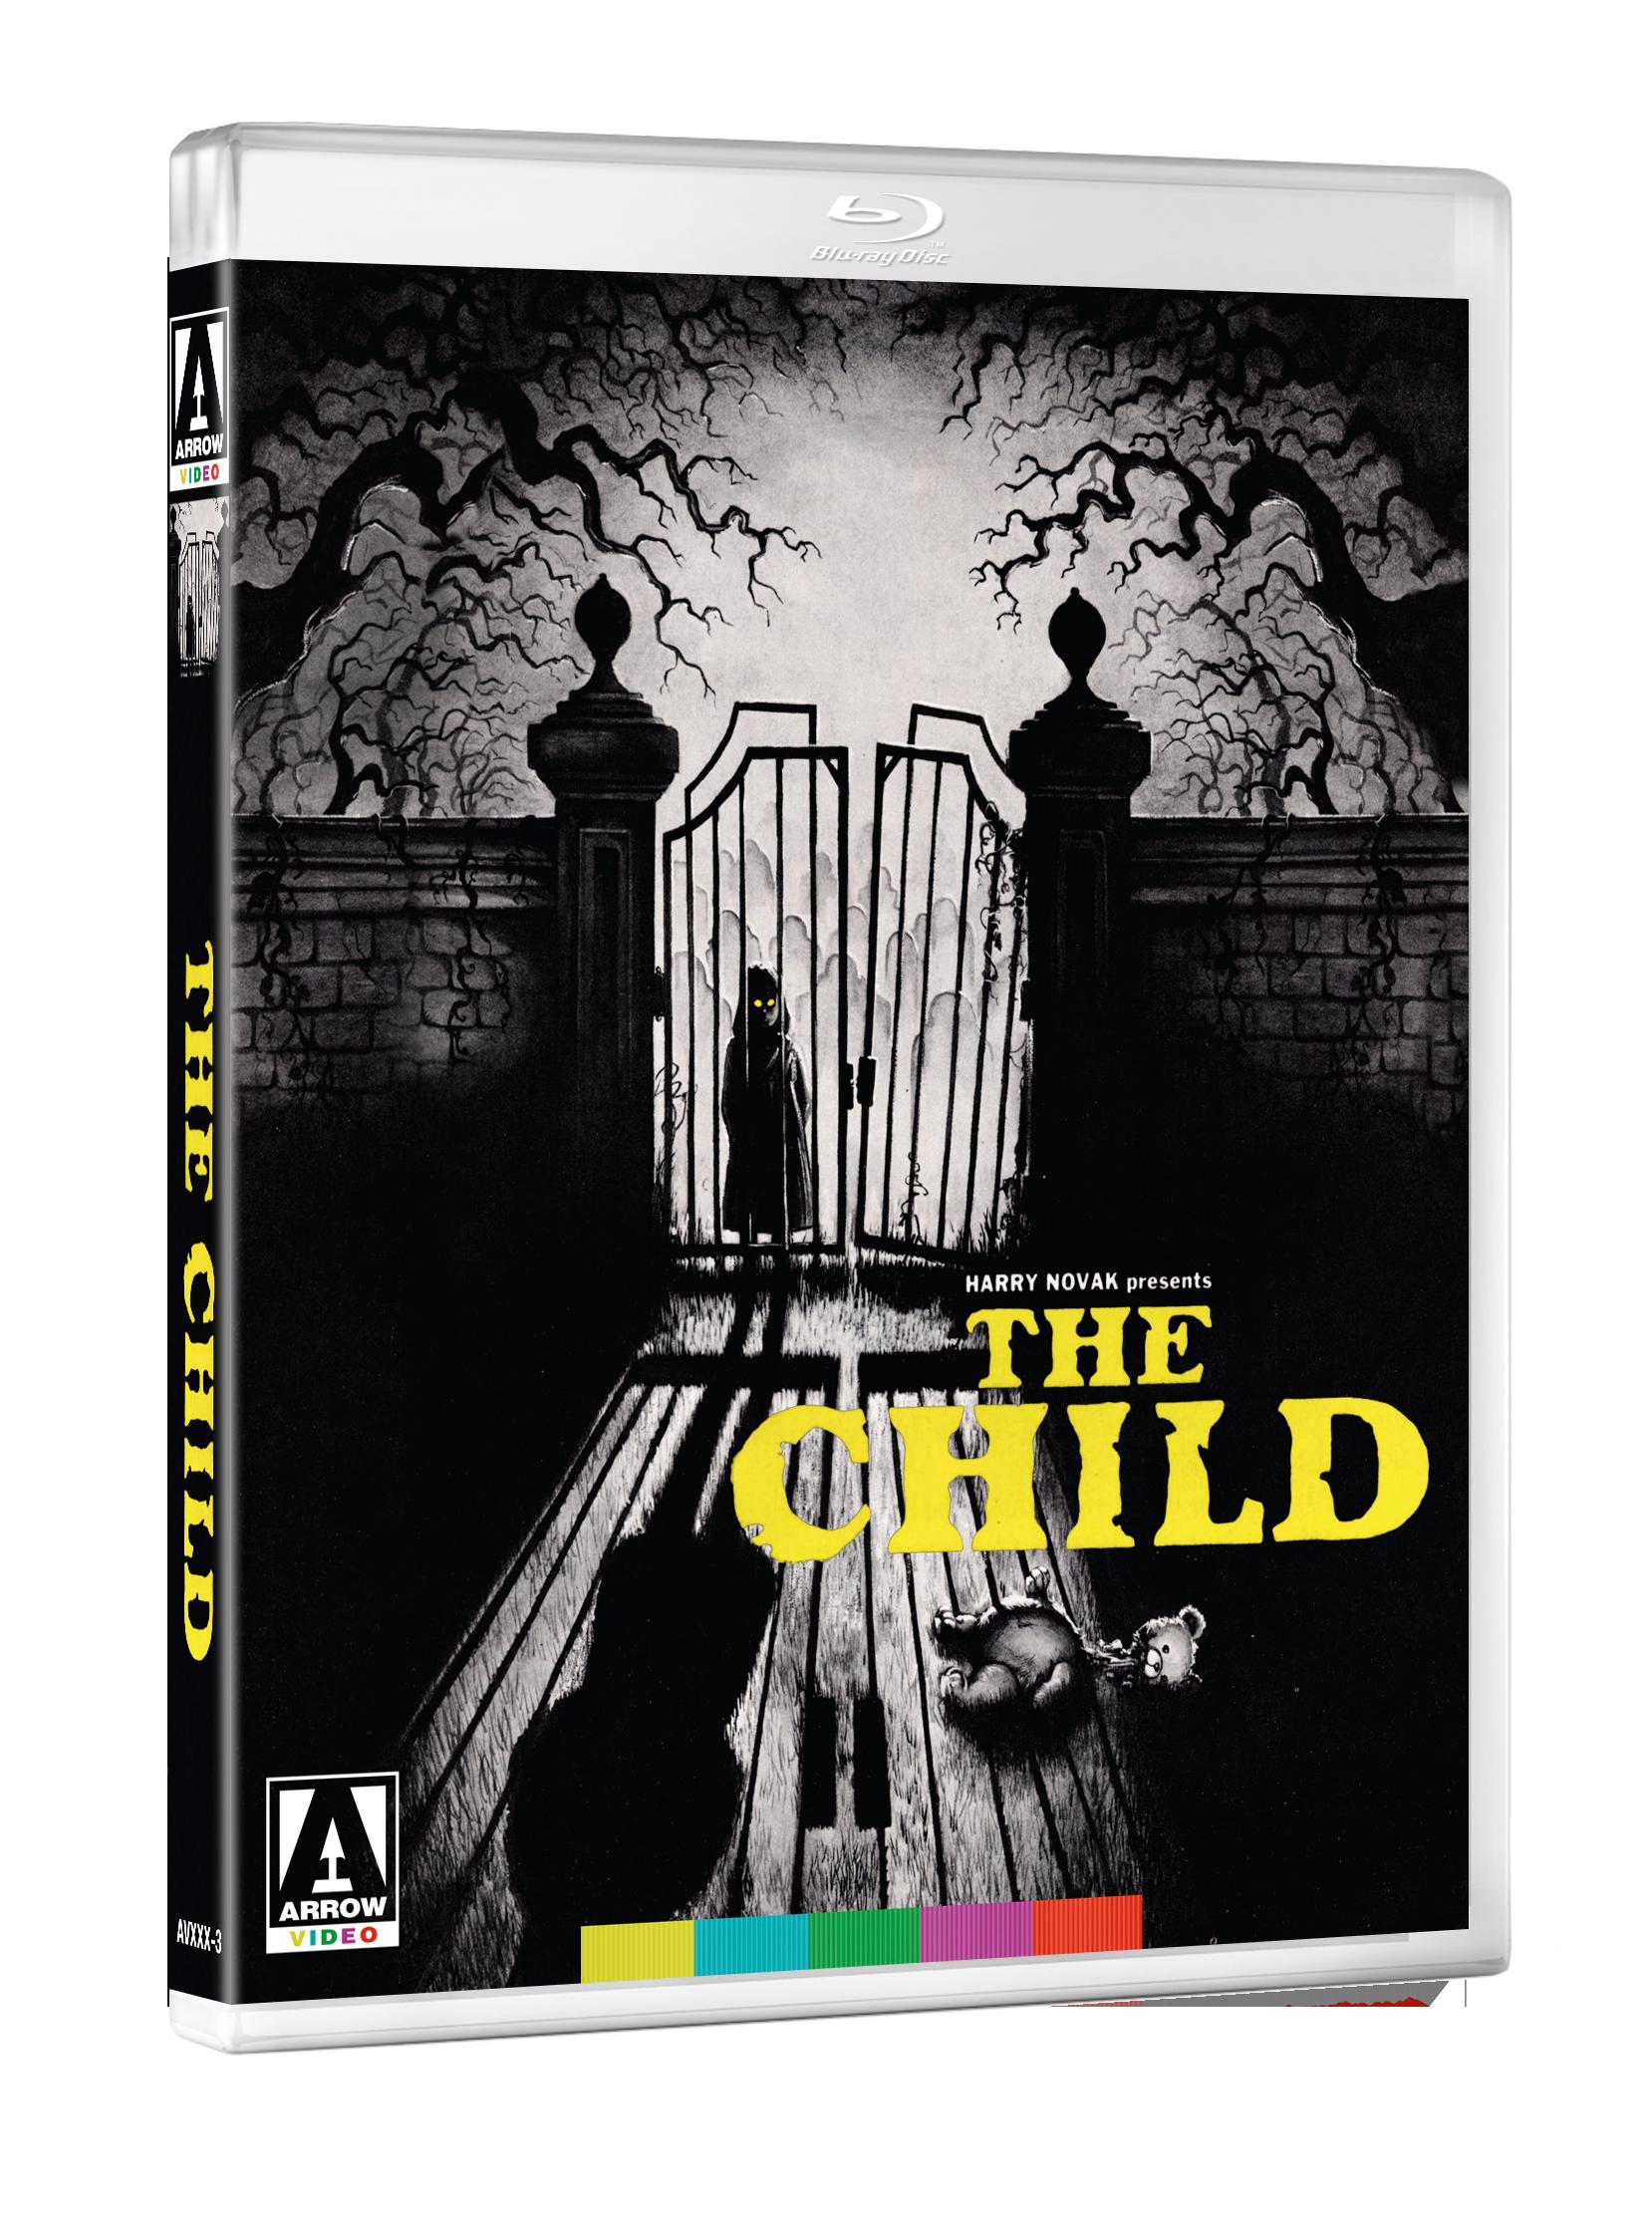 THE_CHILD_3D_BD_REV.png